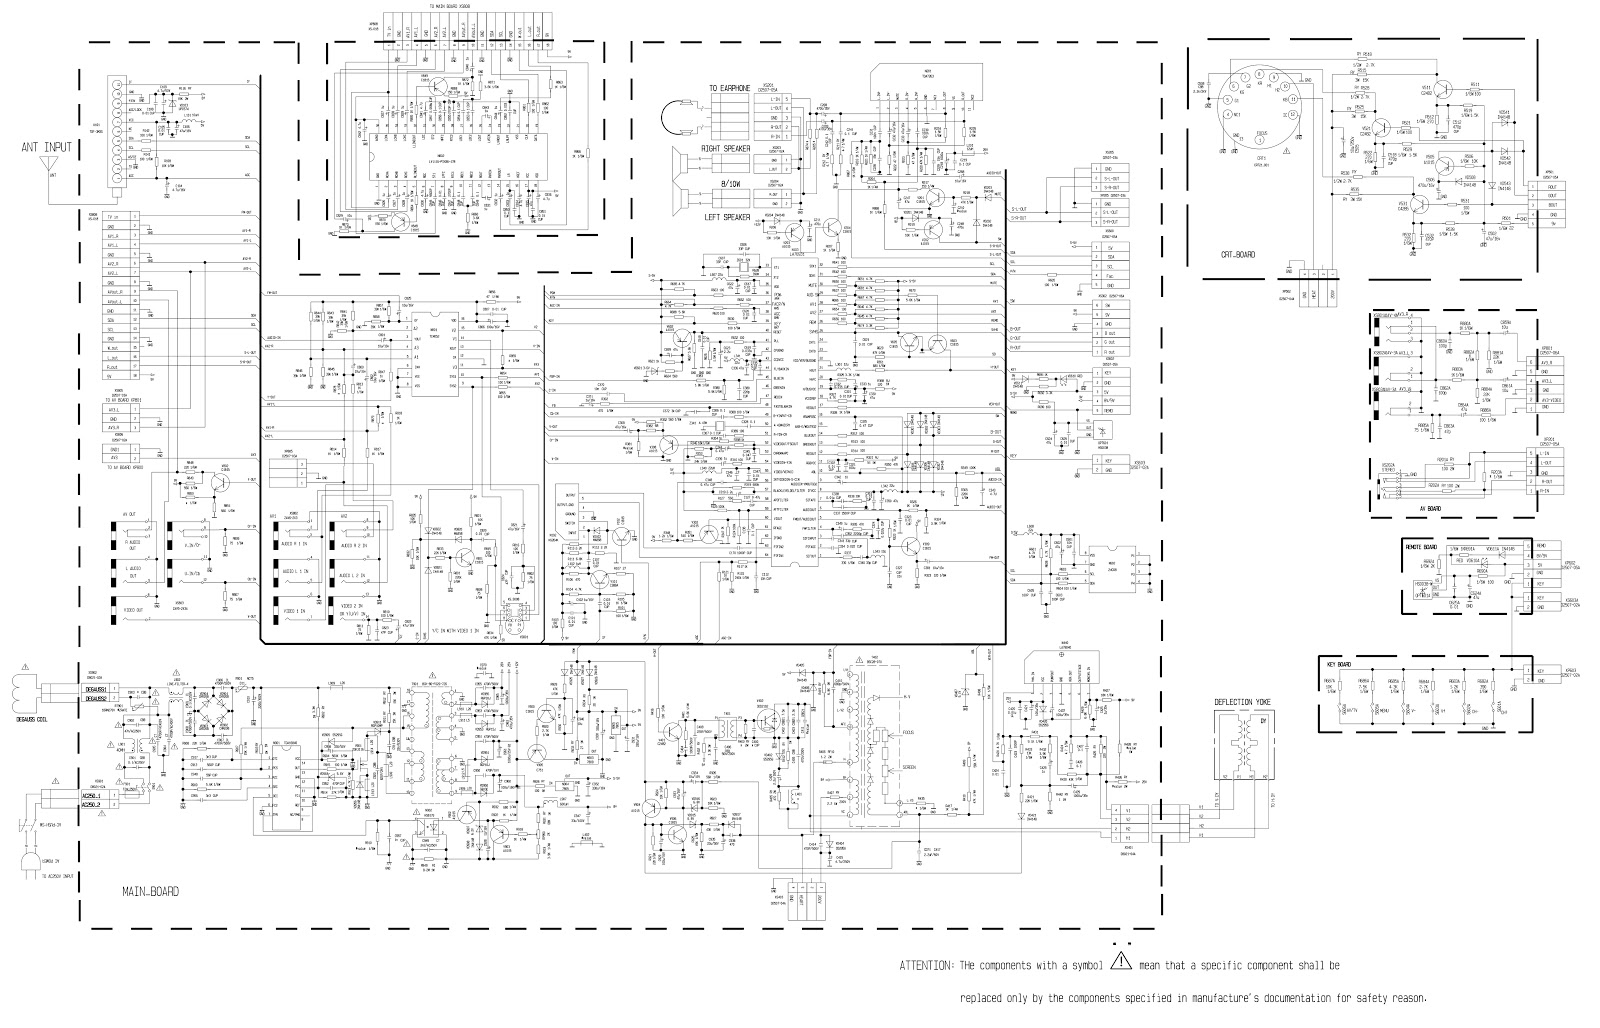 medium resolution of top house kp21sa210 crt tv circuit diagram